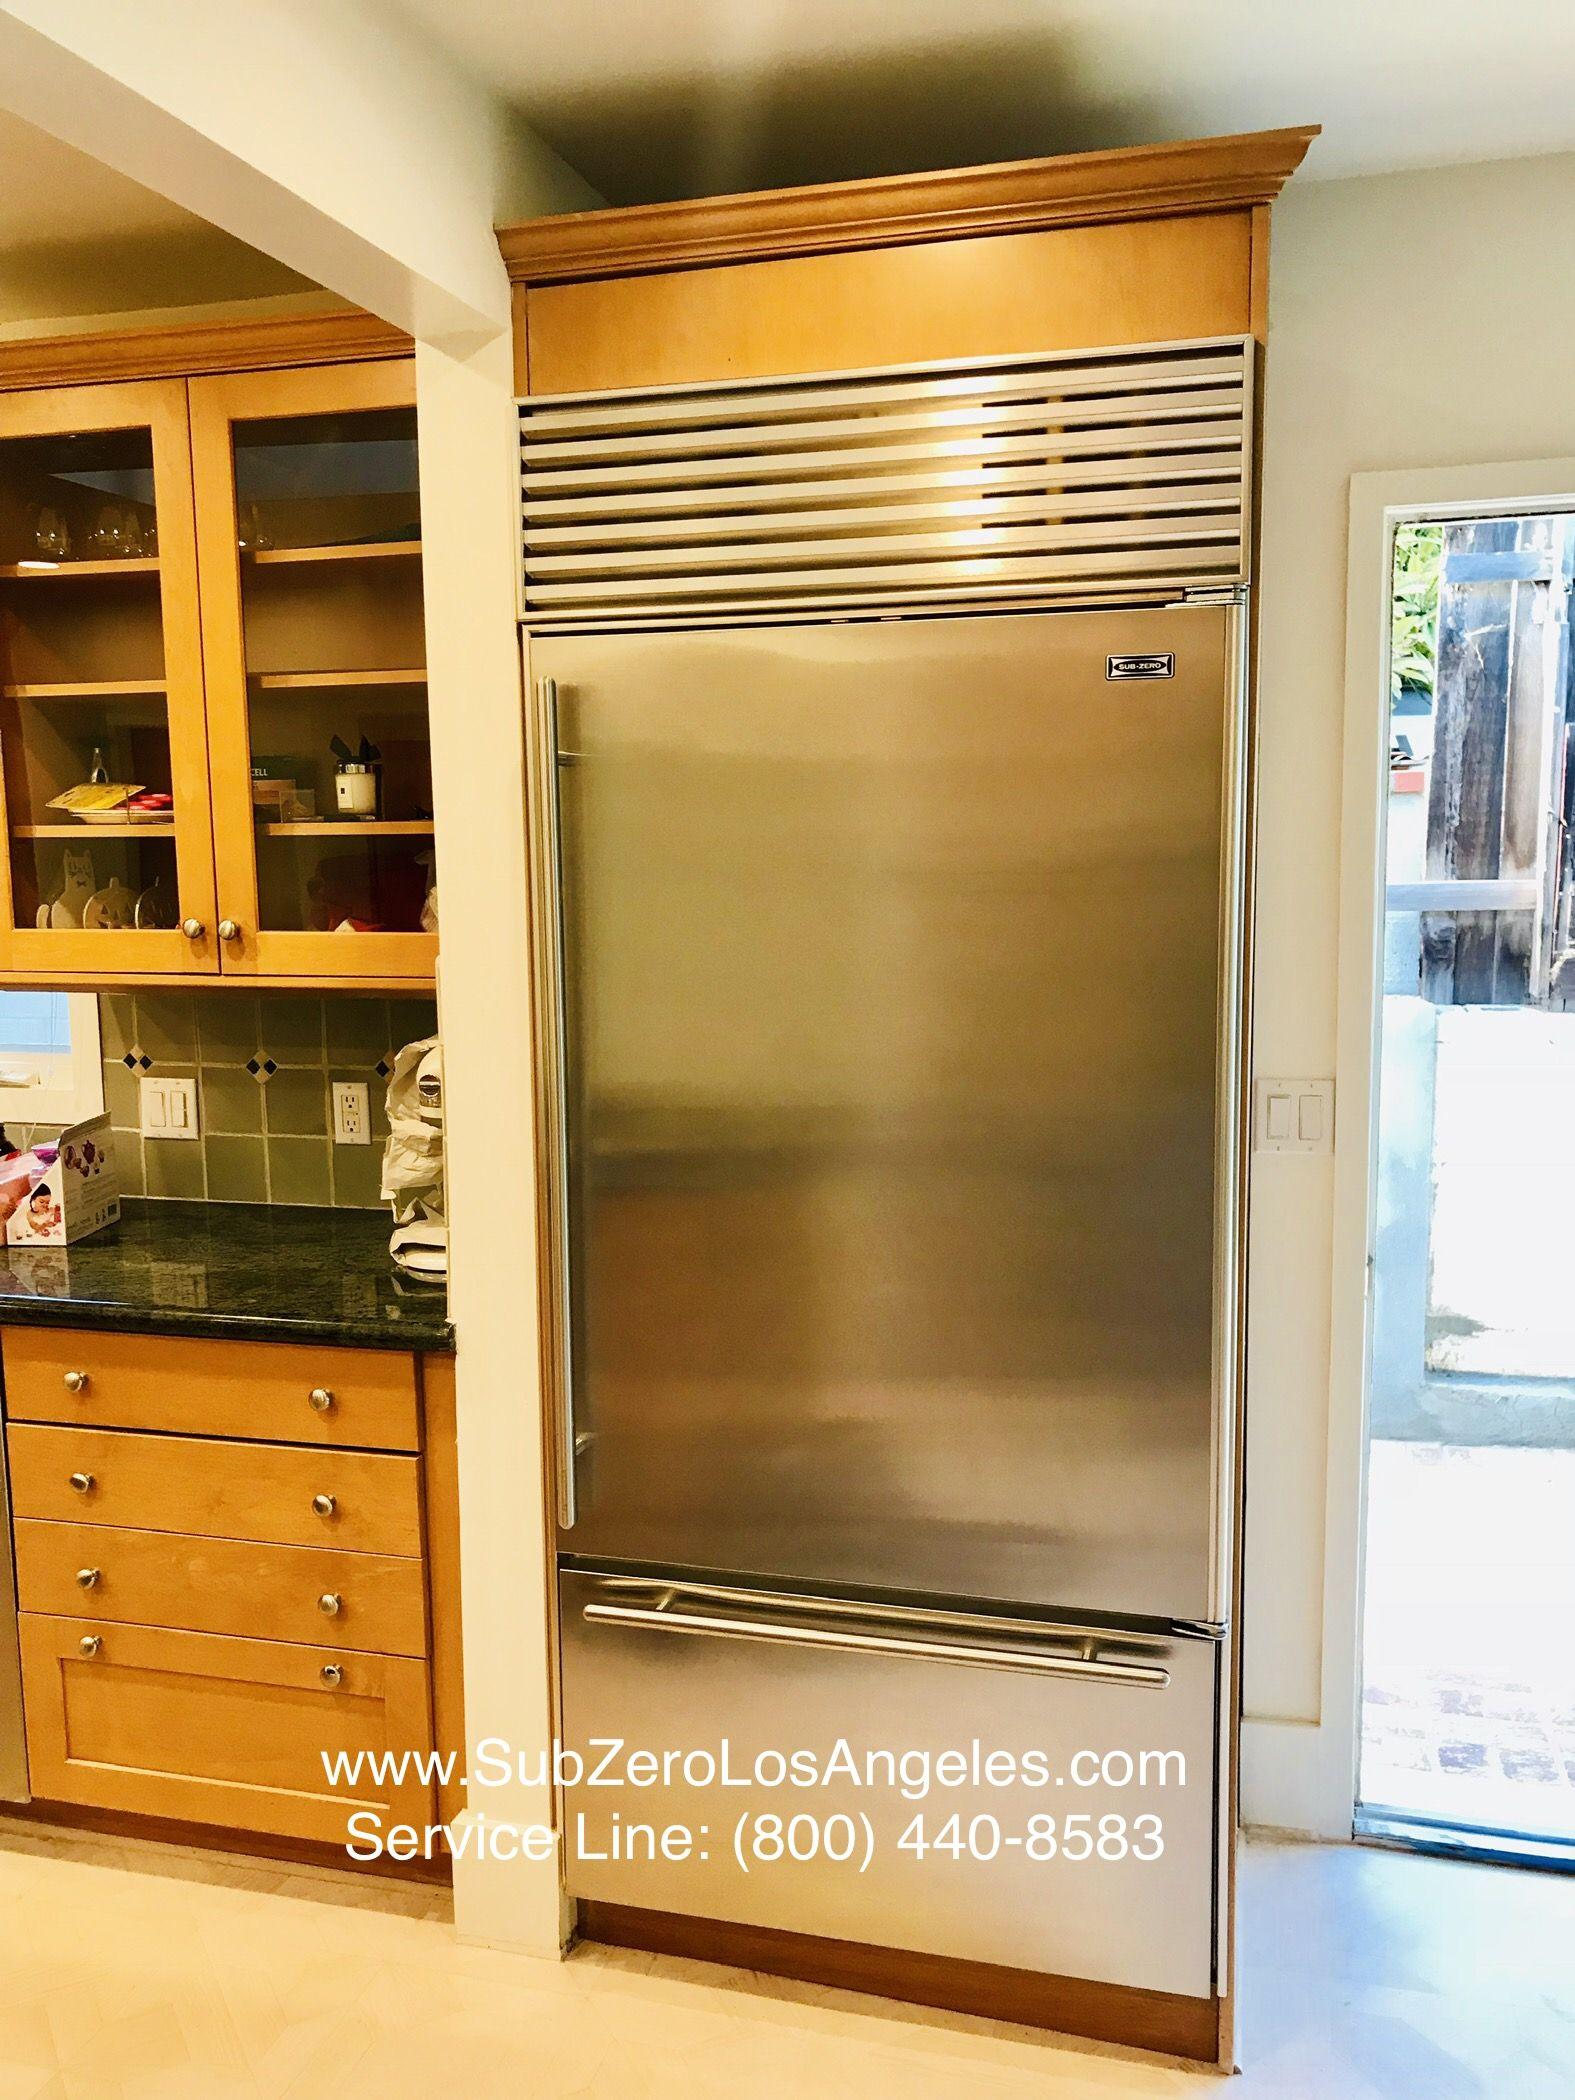 Our recent work SubZero refrigerator, model 650